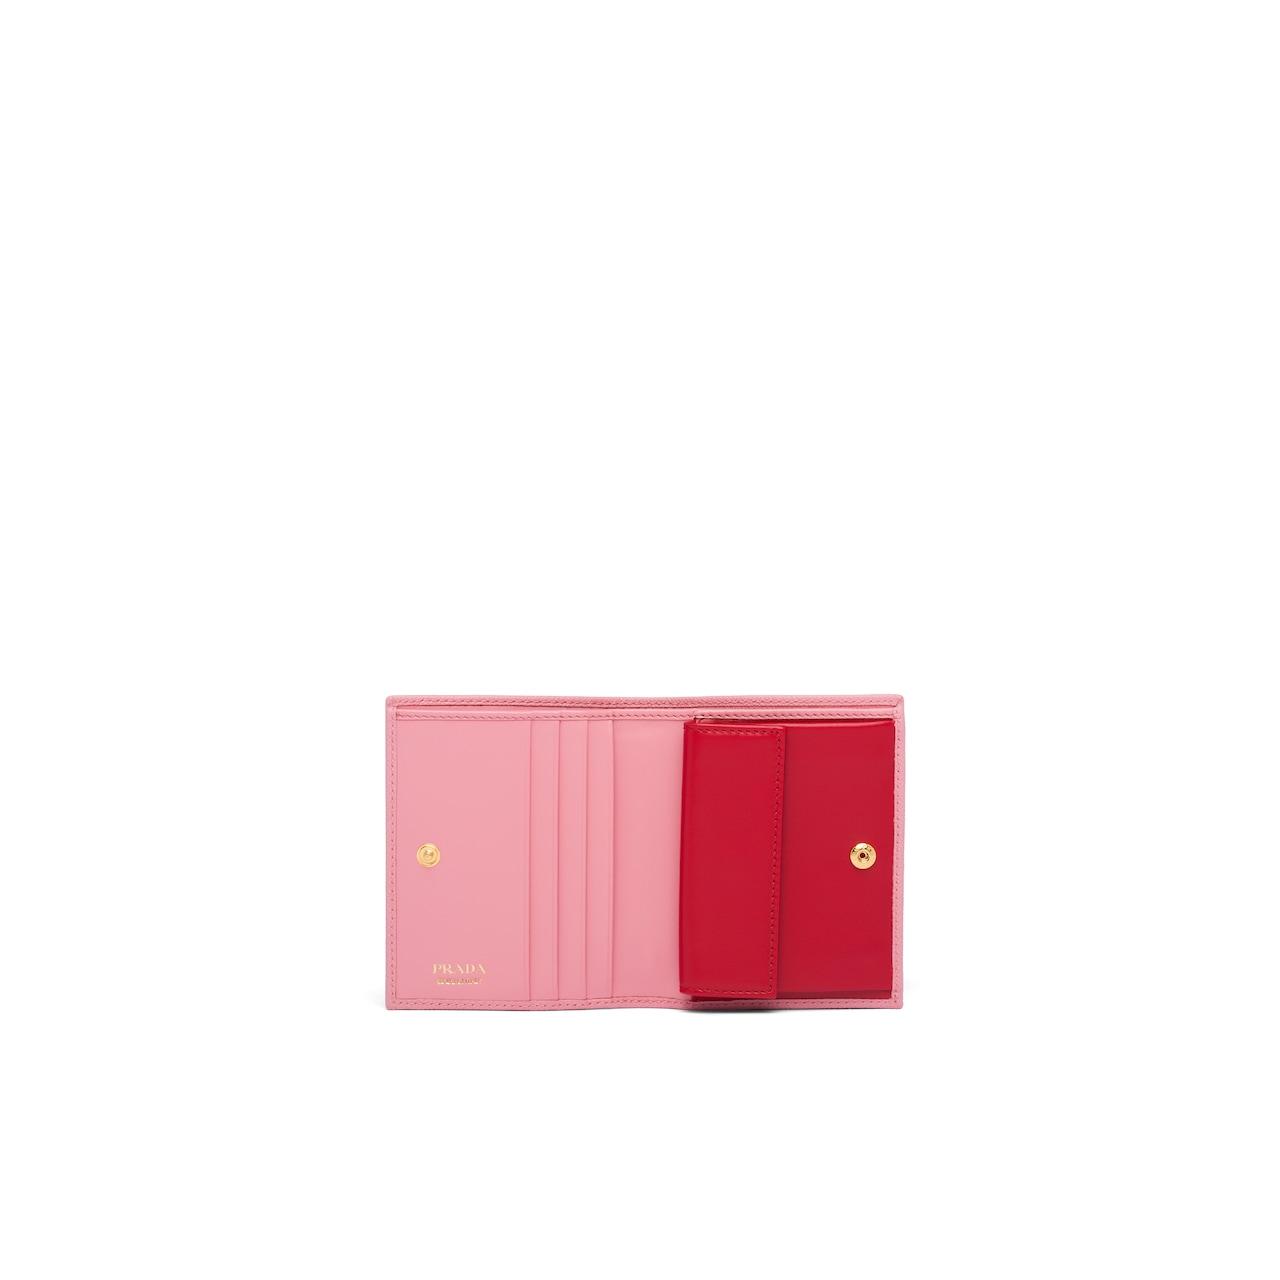 Prada Small Saffiano leather wallet 2